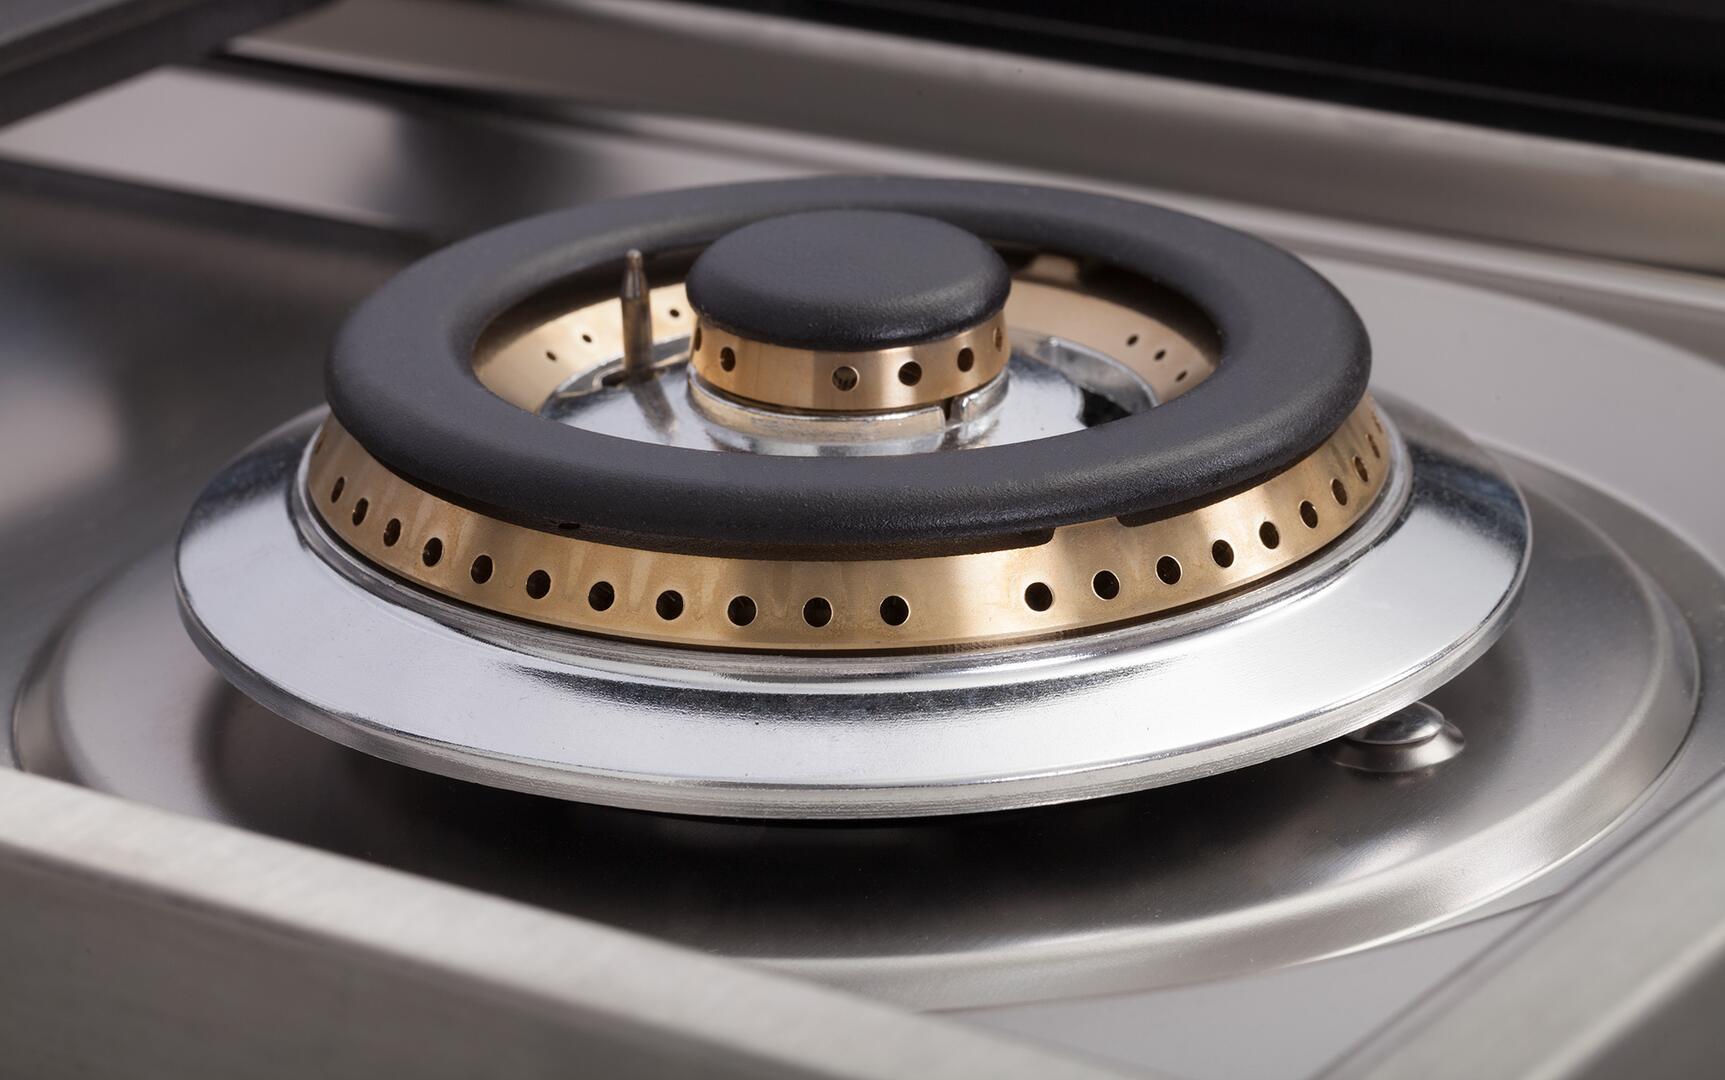 Ilve Professional Plus UPW76DMPBLP Freestanding Dual Fuel Range White, 7